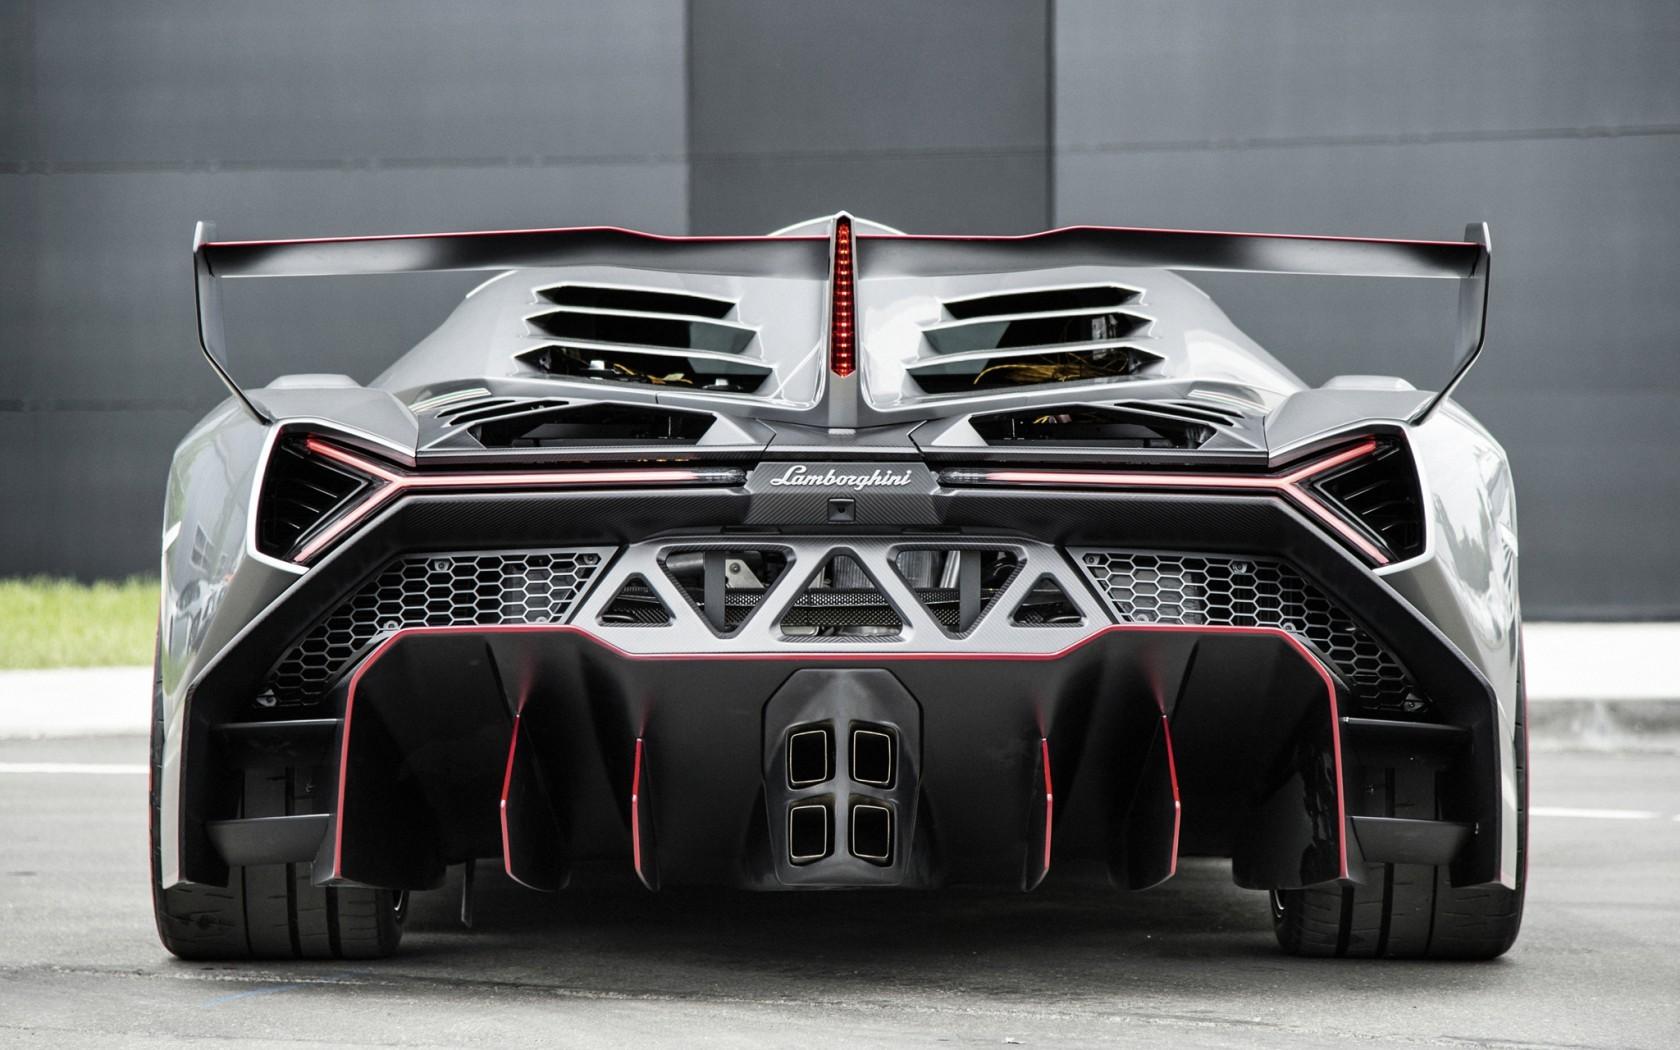 Wallpaper 1680x1050 Px Car Lamborghini Veneno 1680x1050